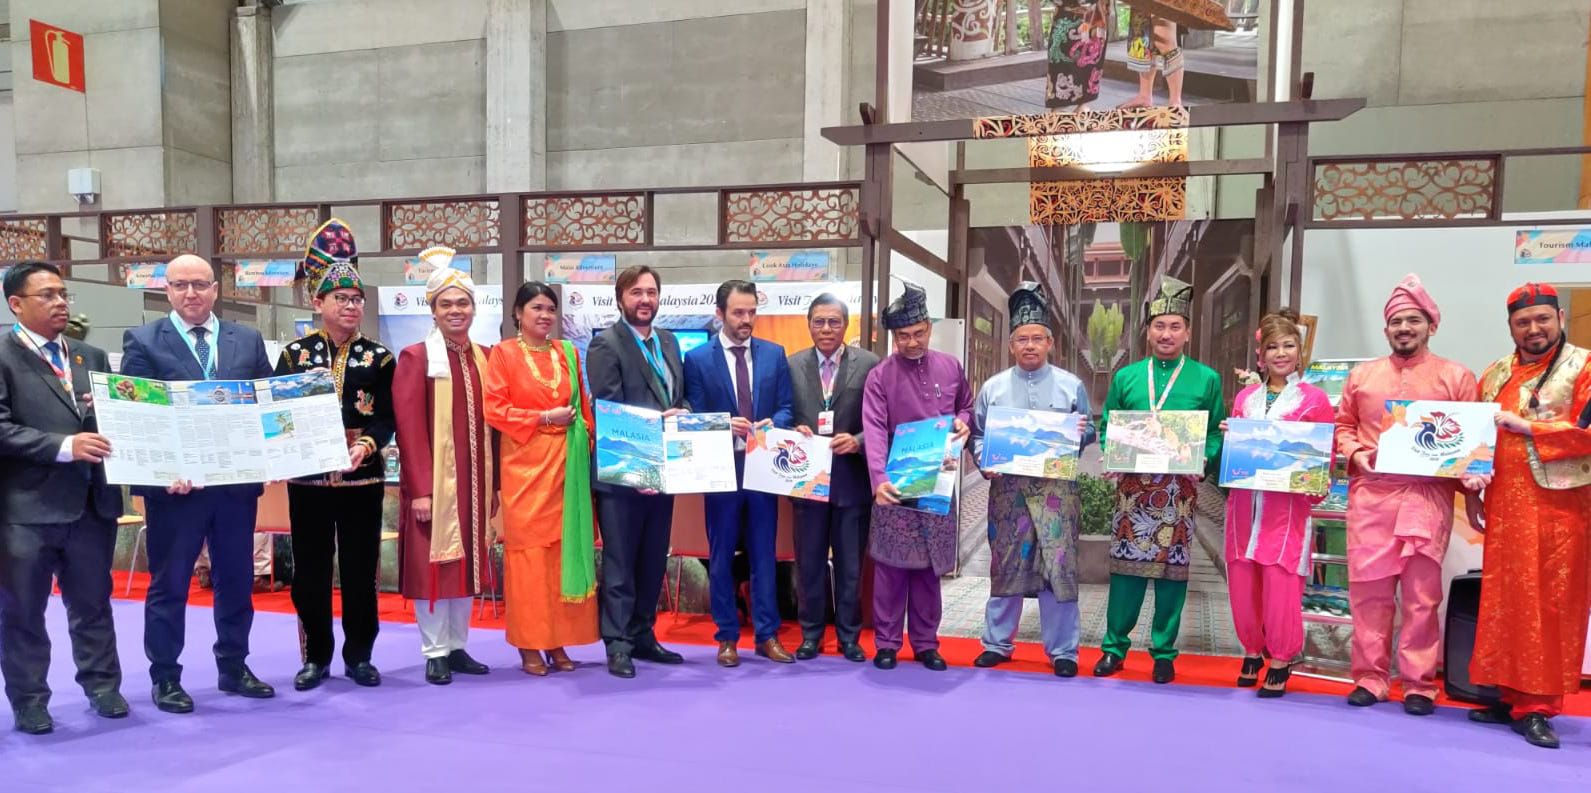 Foto de TUI Iberia & Tourism Malaysia launch VM2020 travel package